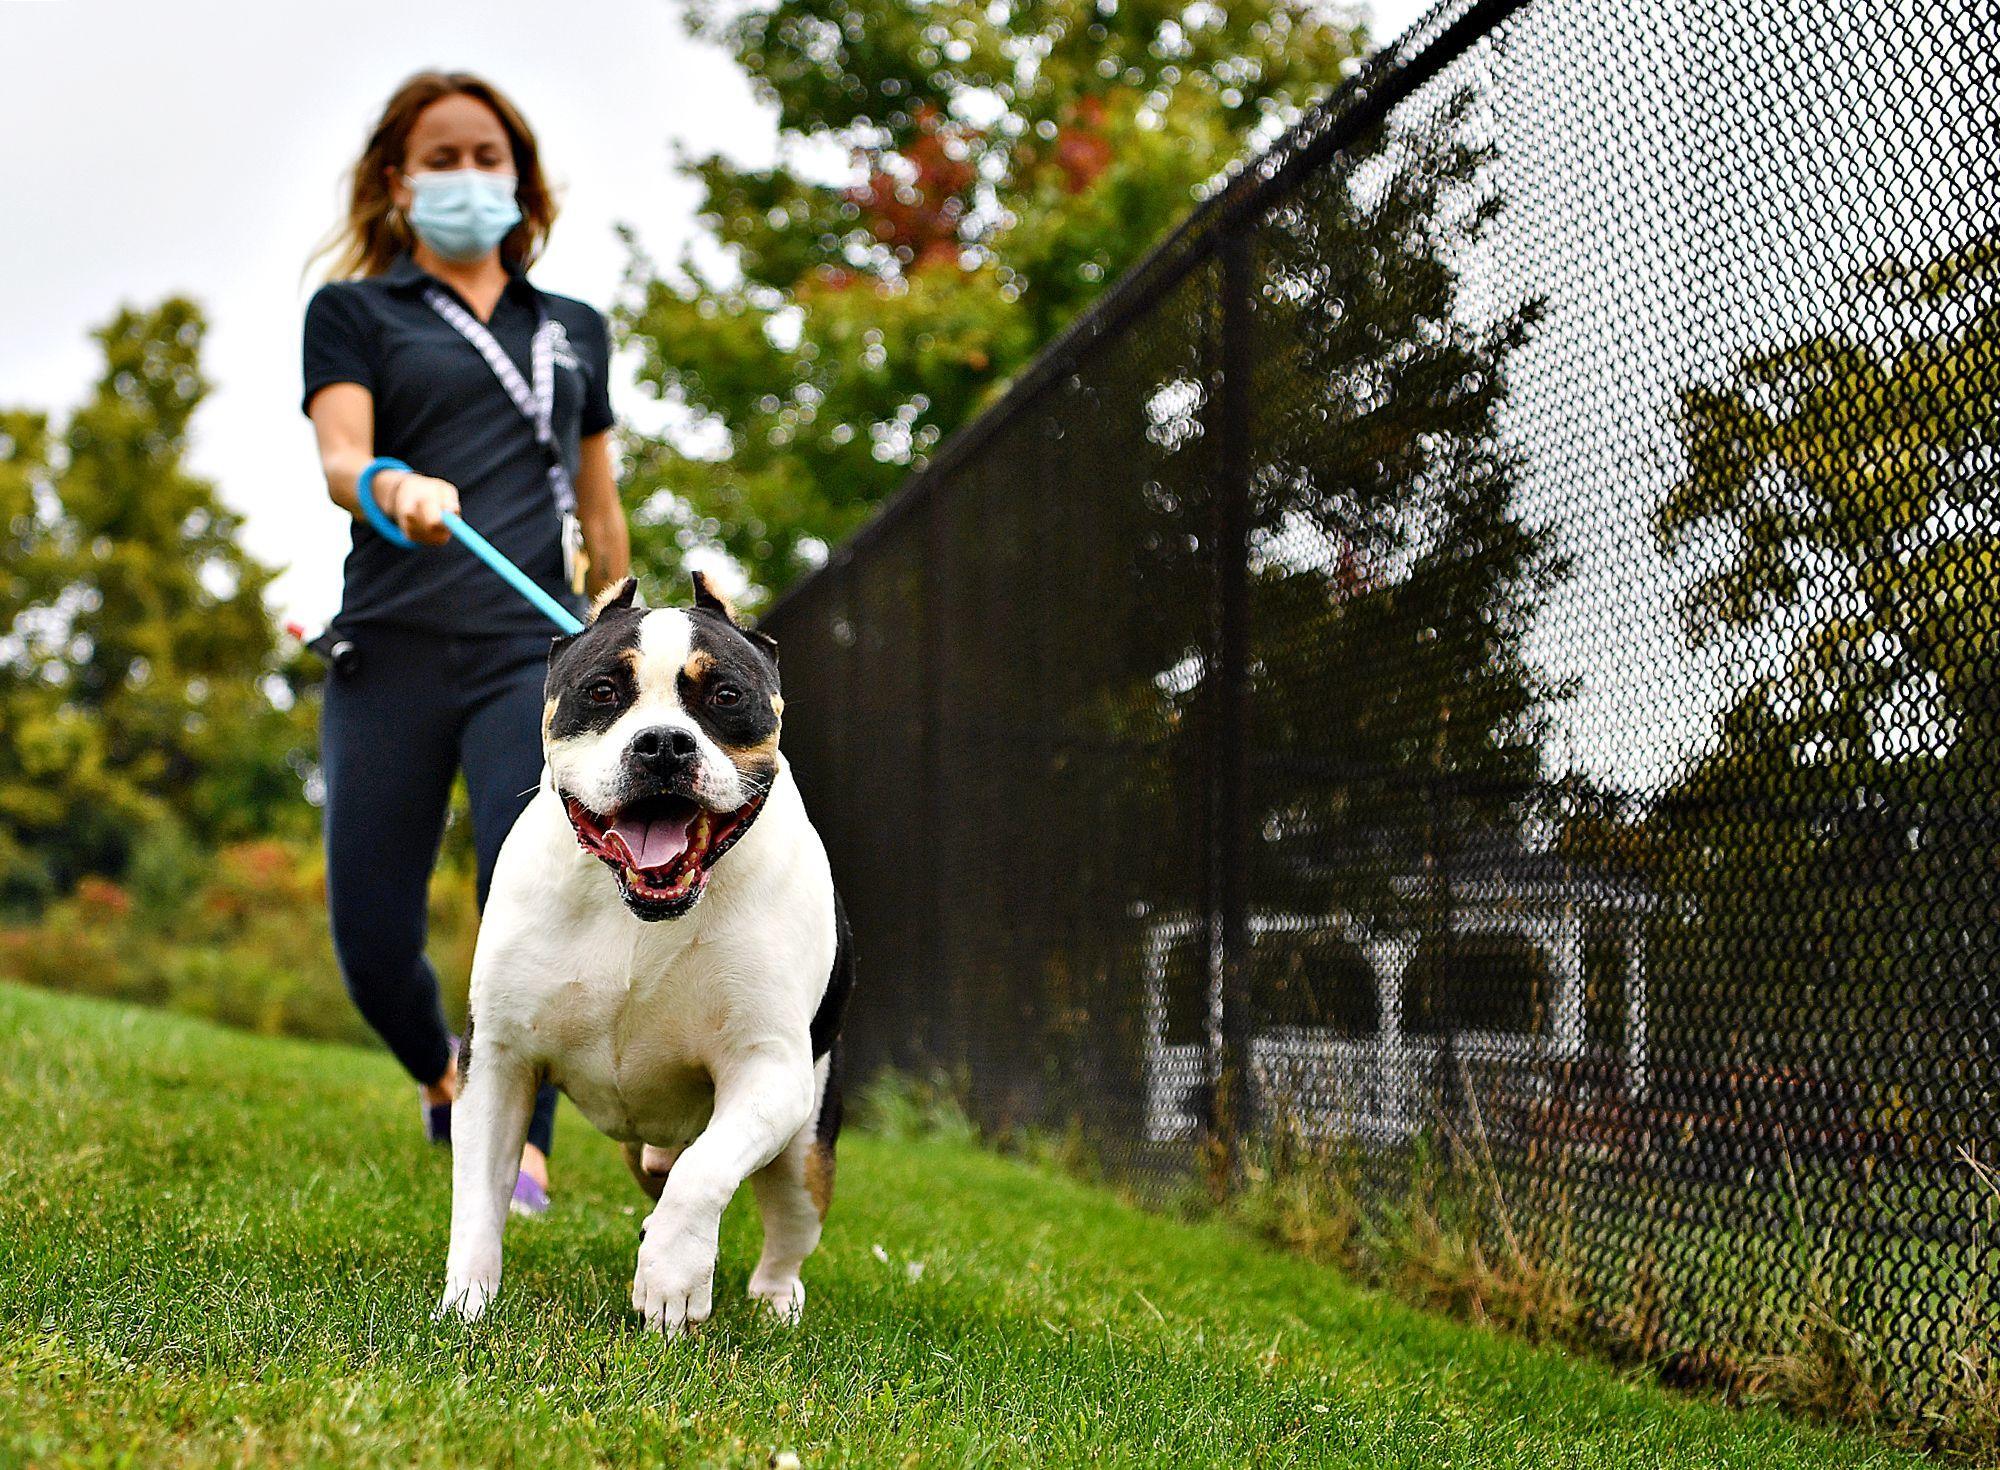 The Good Dog Advice Column: Leash Pulling